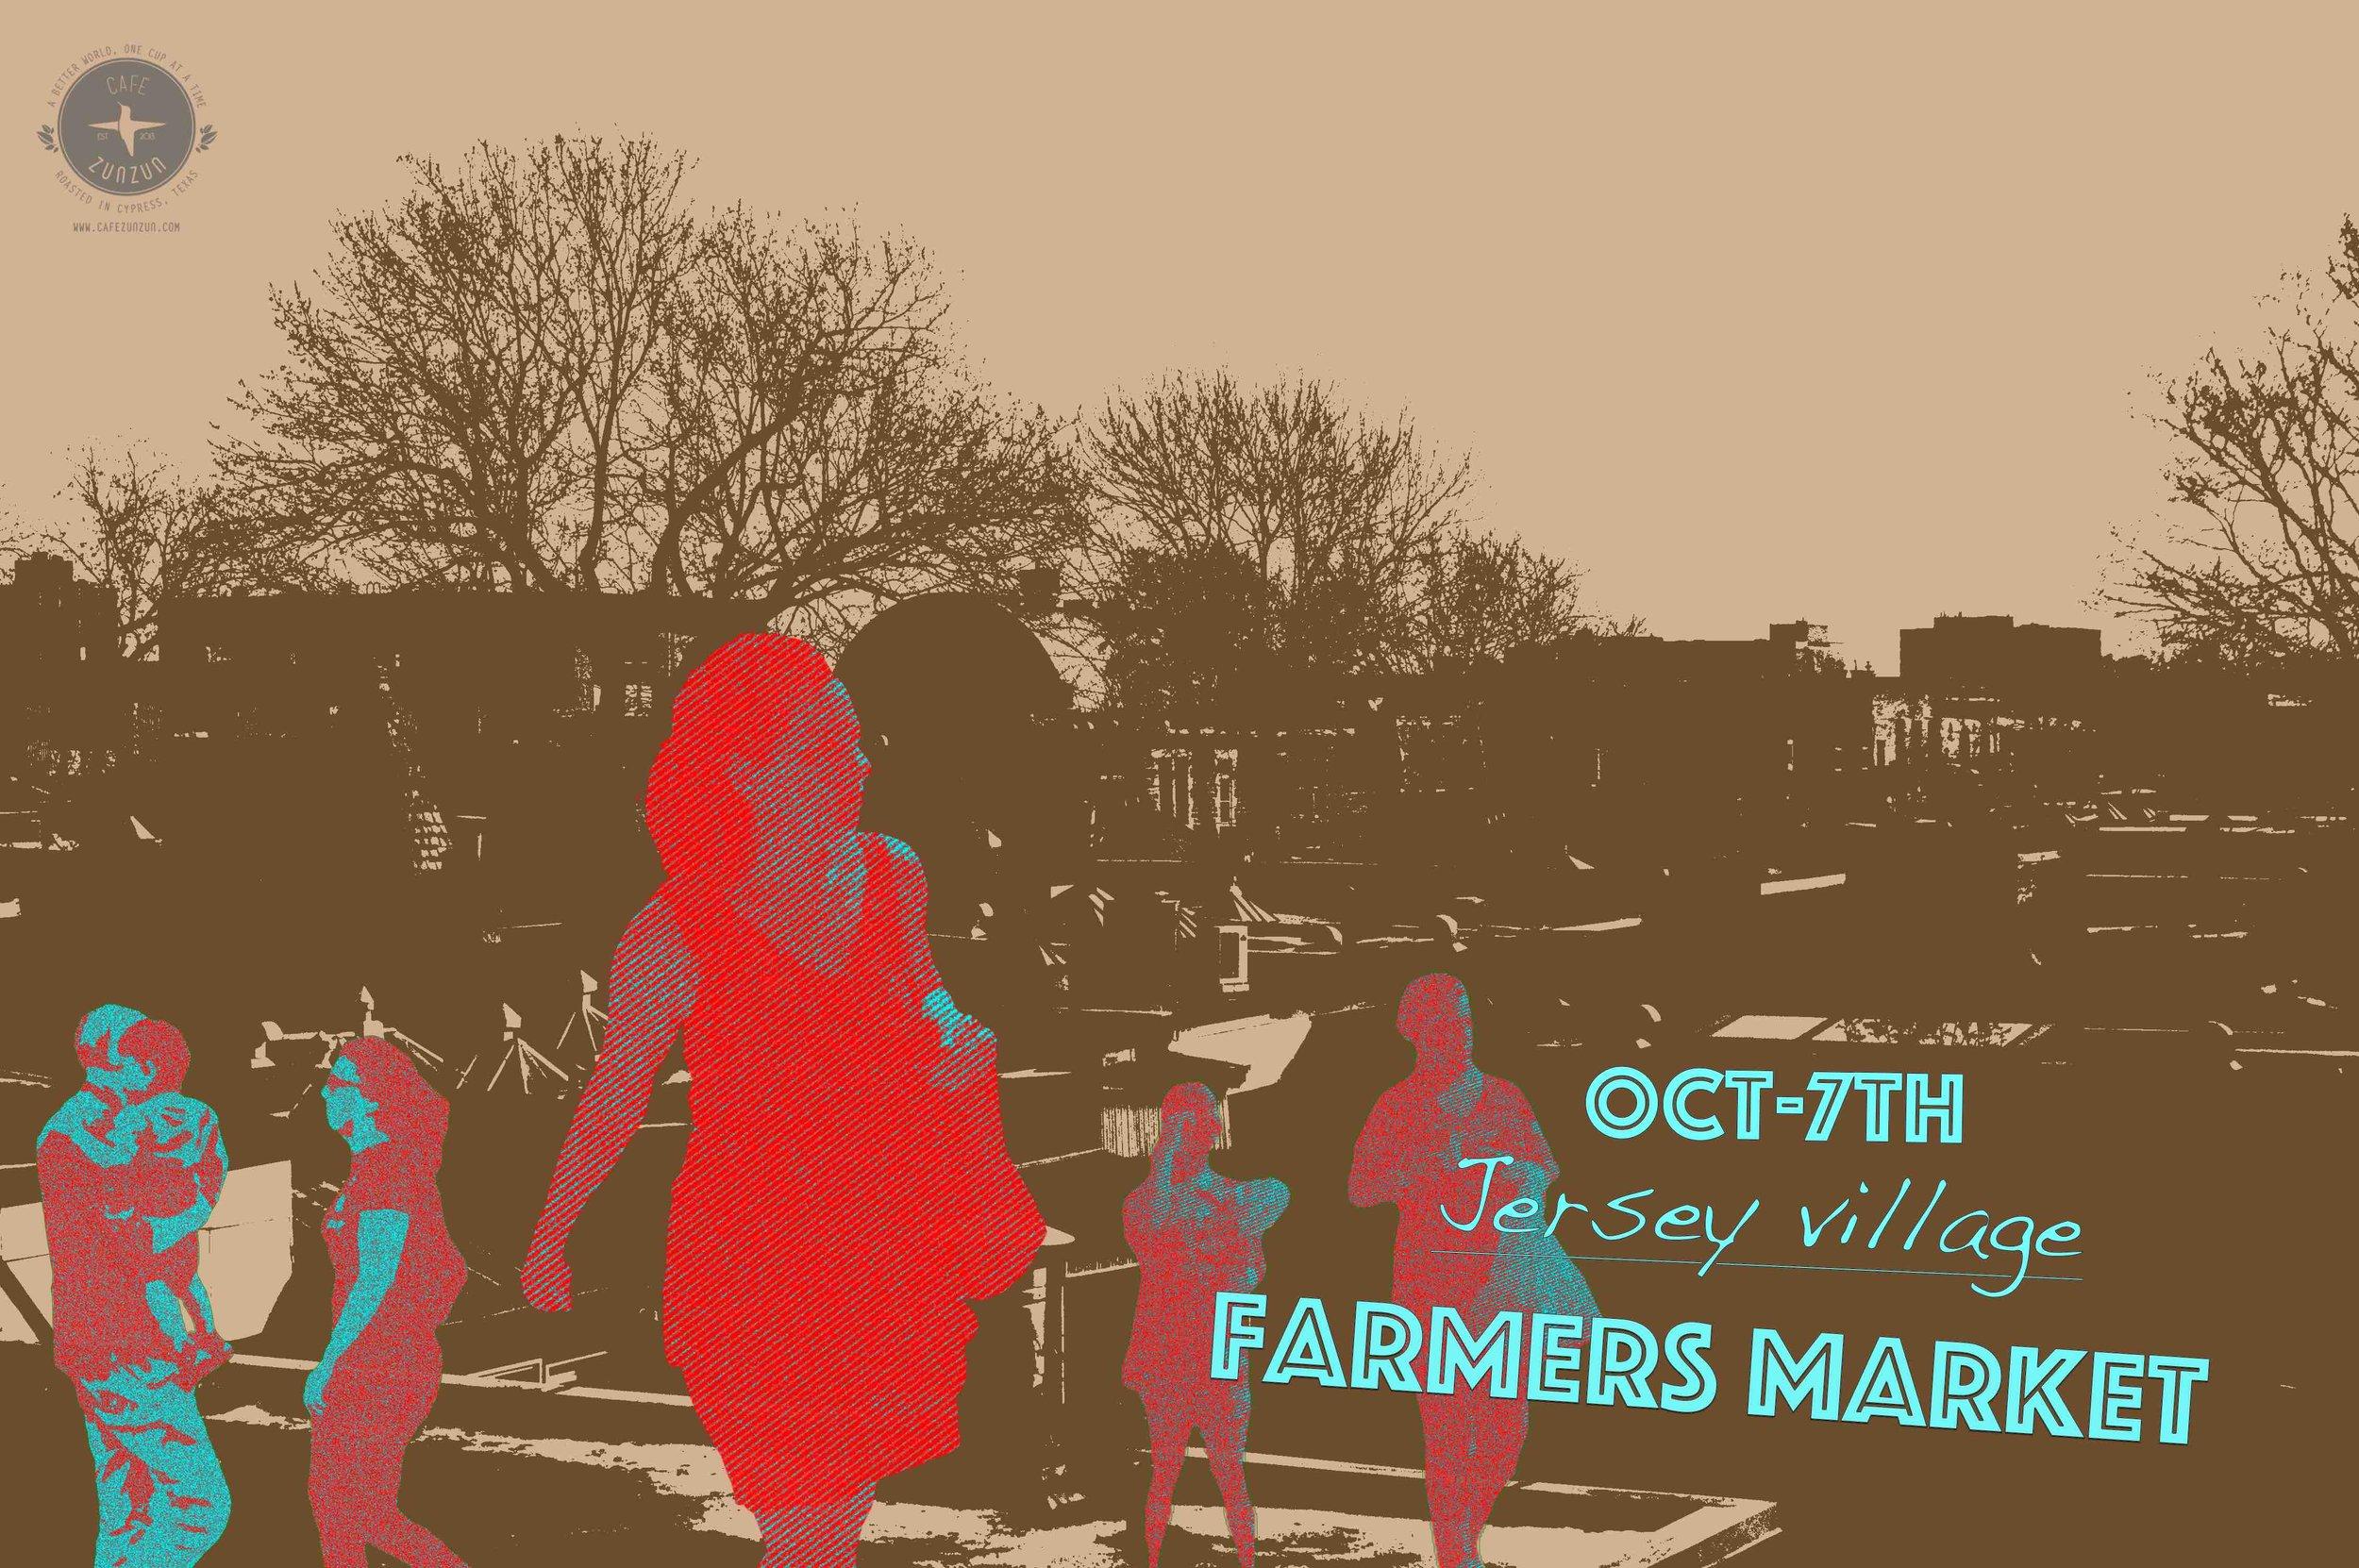 JERSEY VILLAGE FARMERS MARKET OCT:07:18.jpg